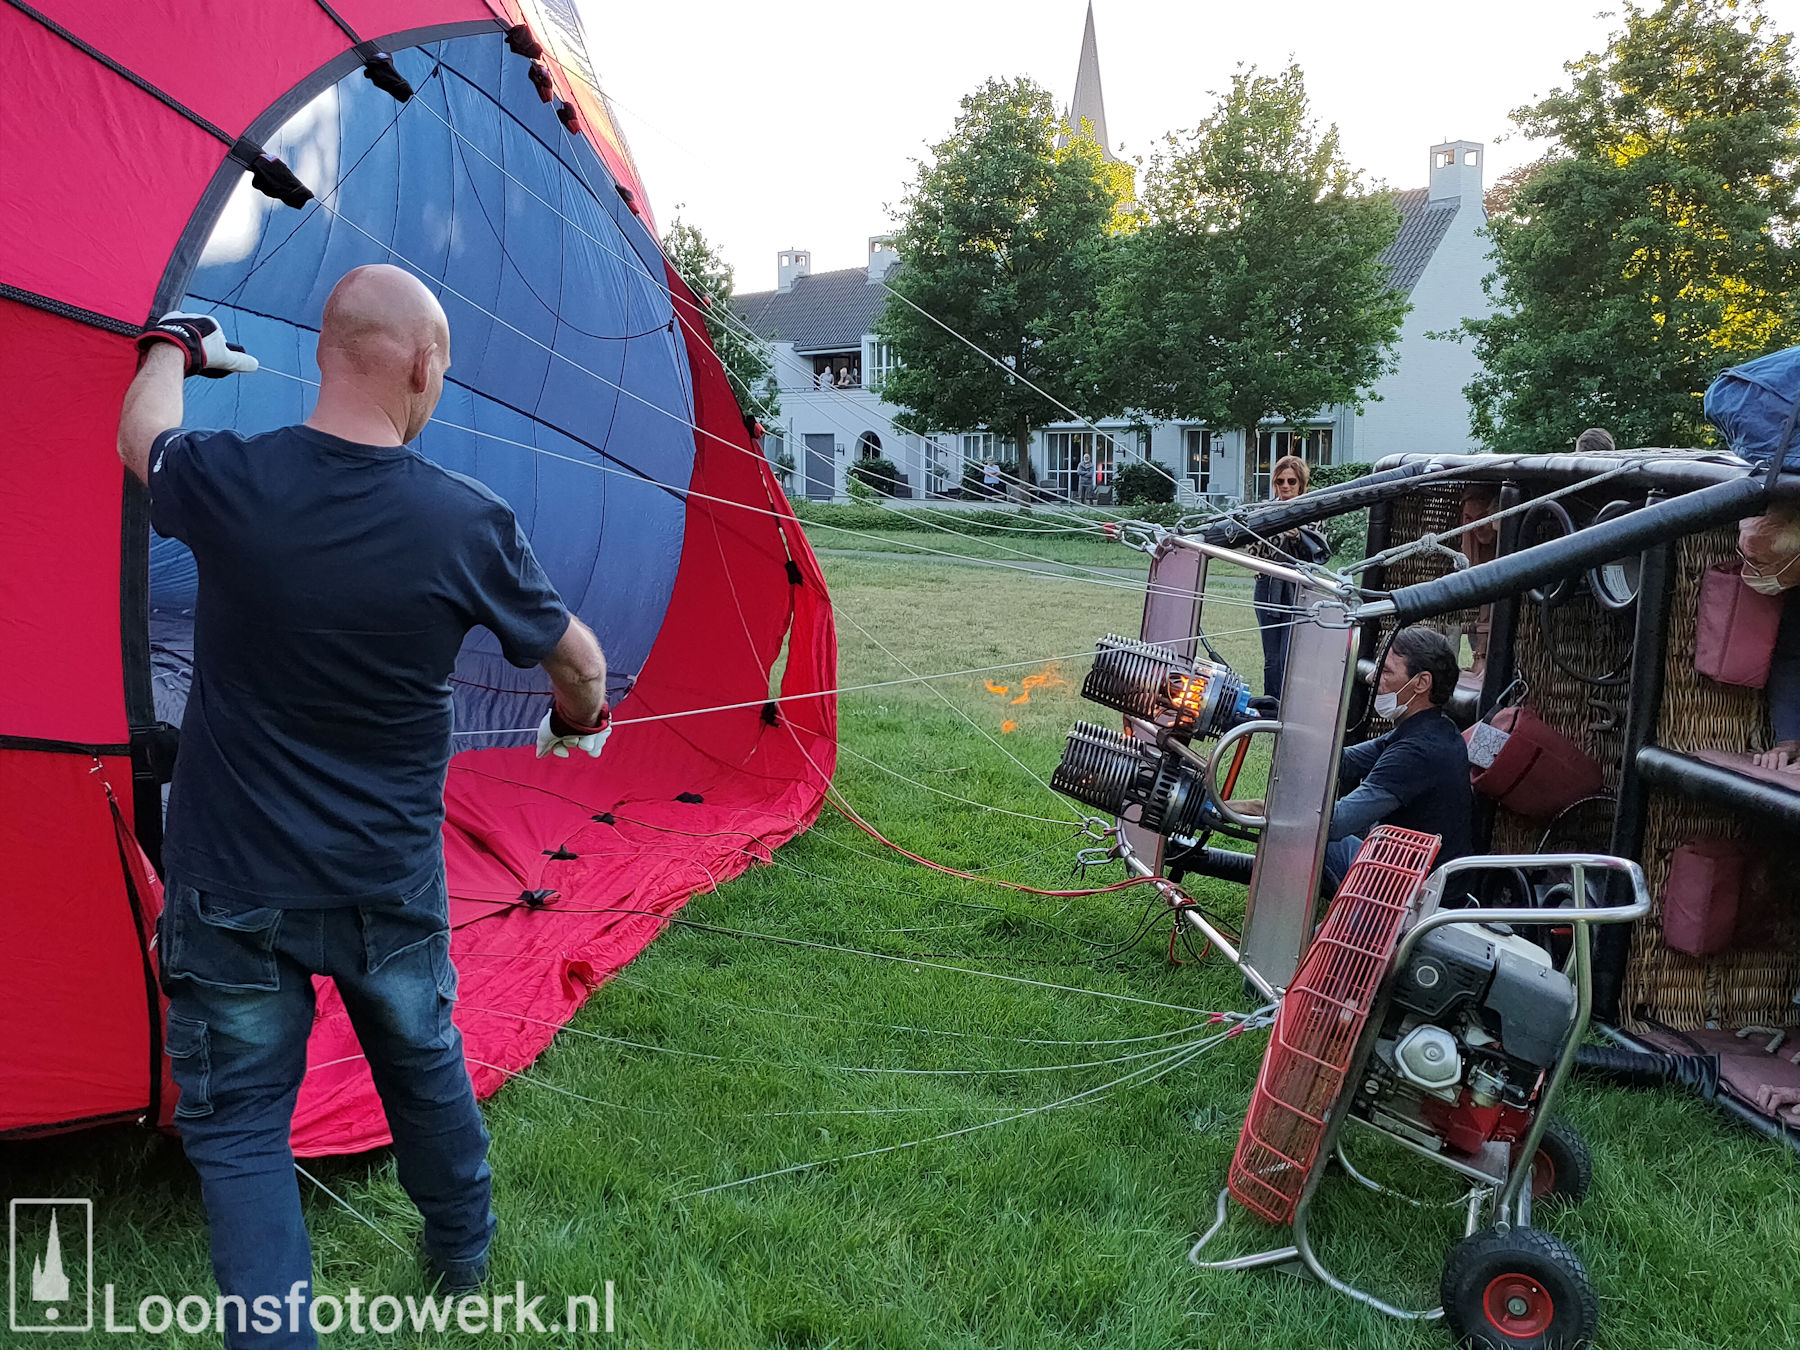 Ballonvaart vanaf de Kasteelweide 17